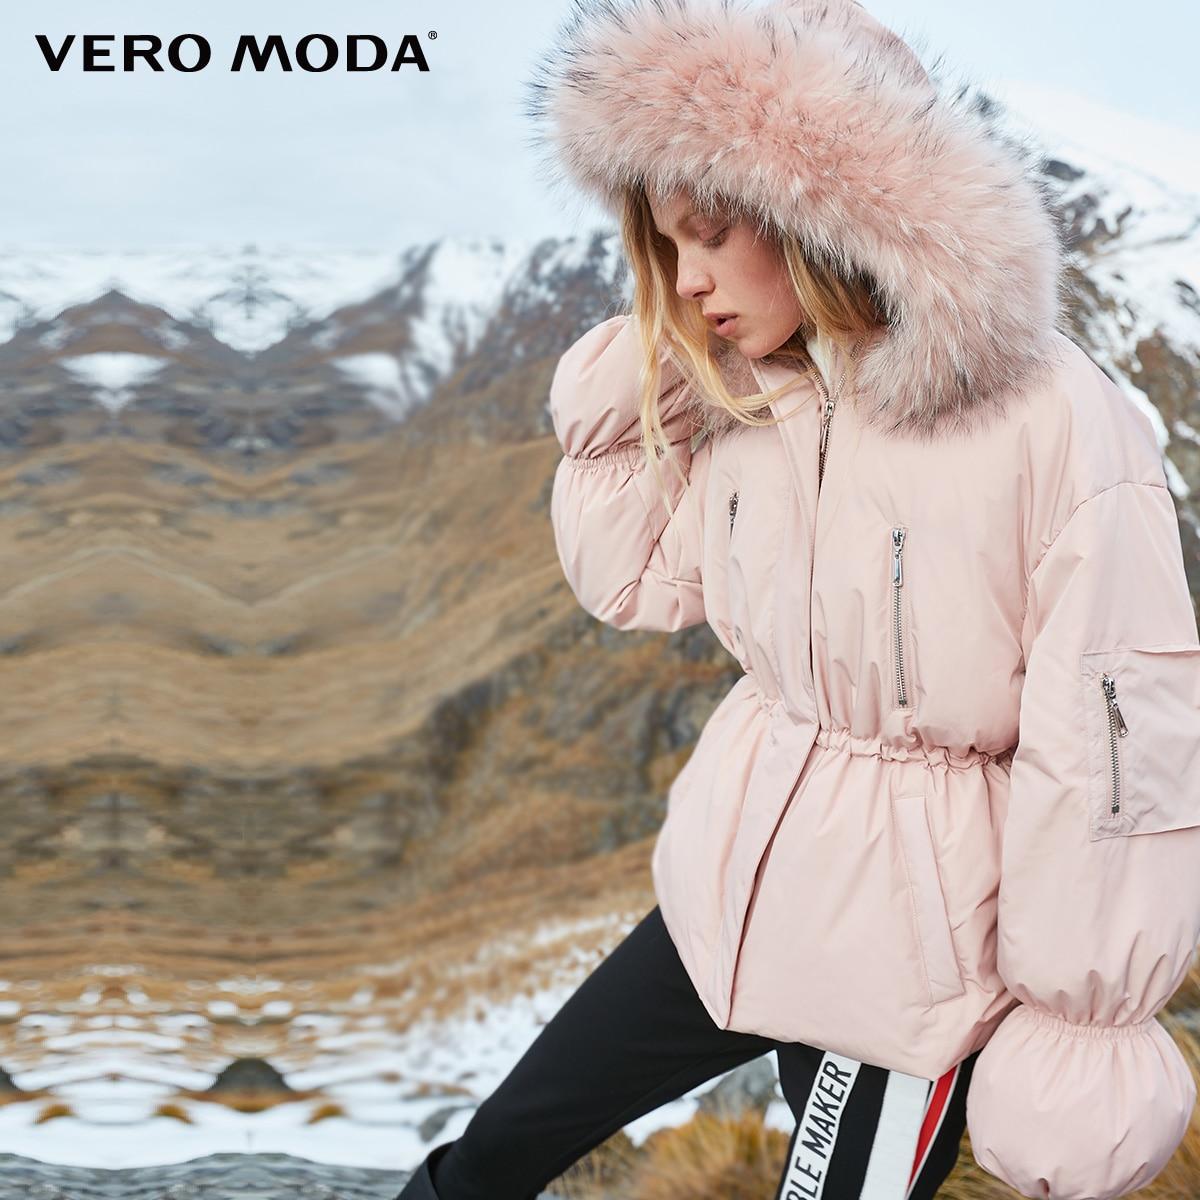 Vero Moda Women's New Hooded Bell Sleeve   Down   Jacket Parka   Coat     318423511